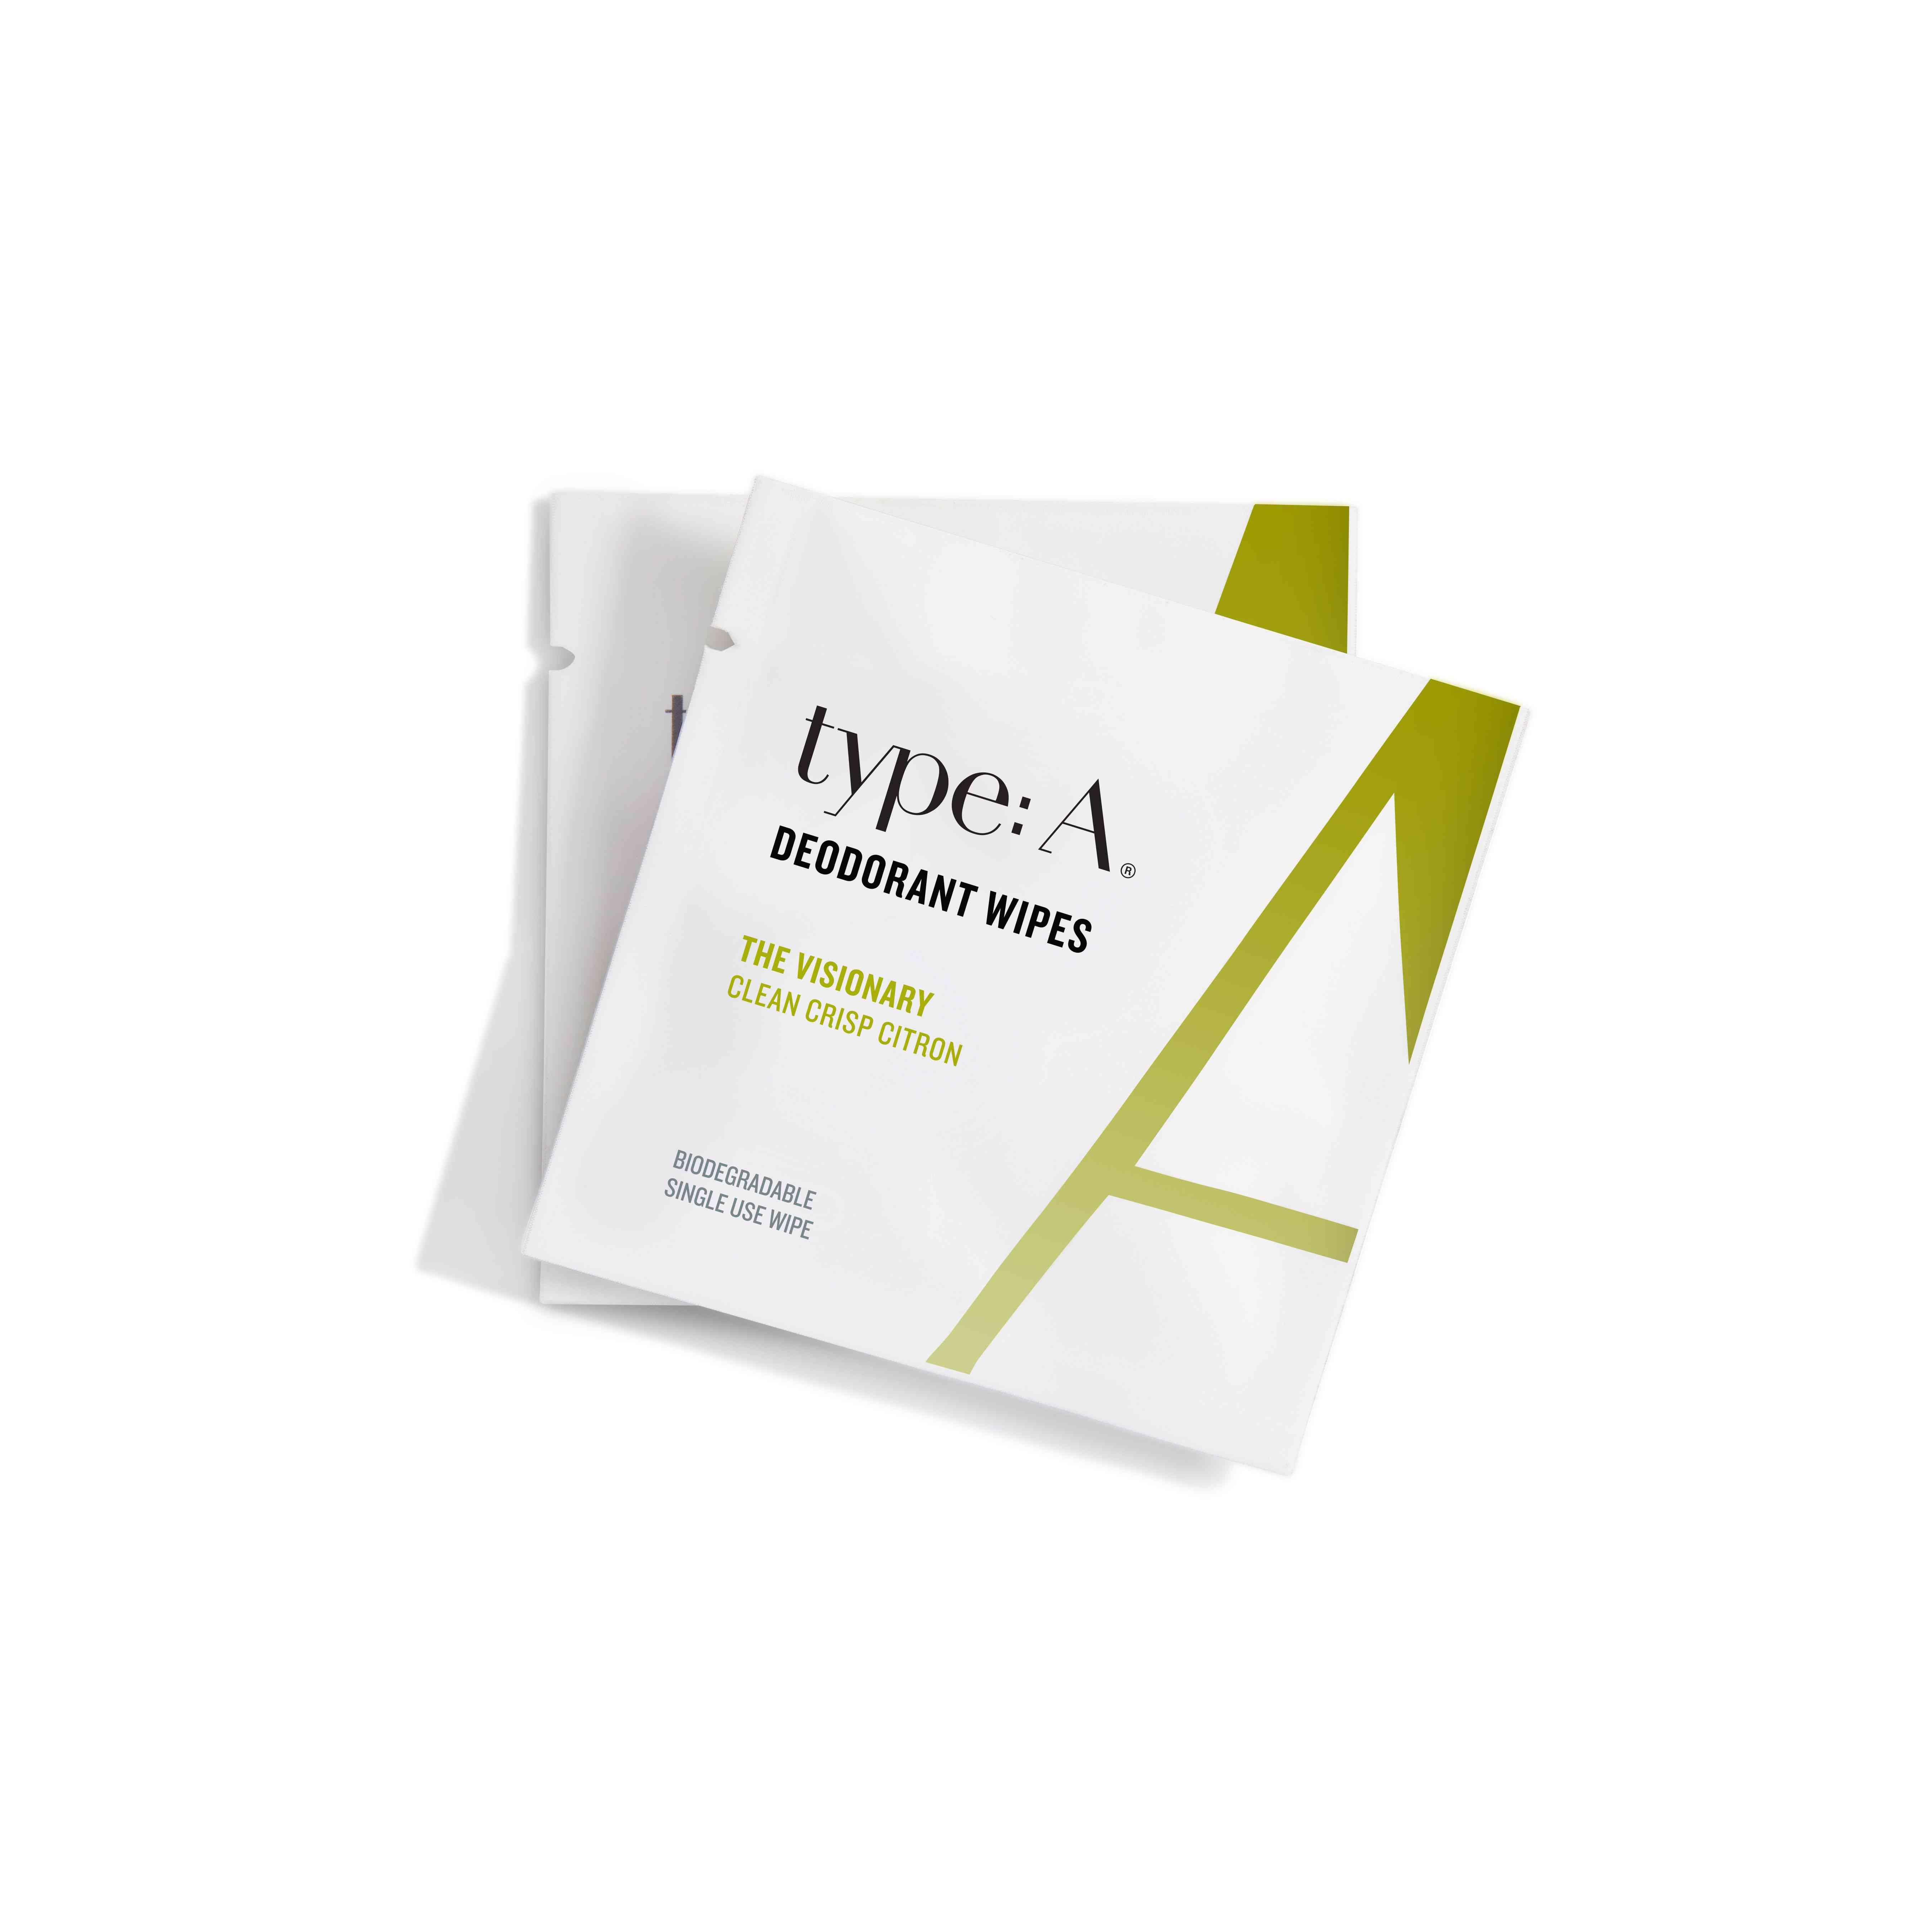 Type: A Deodorant Wipes